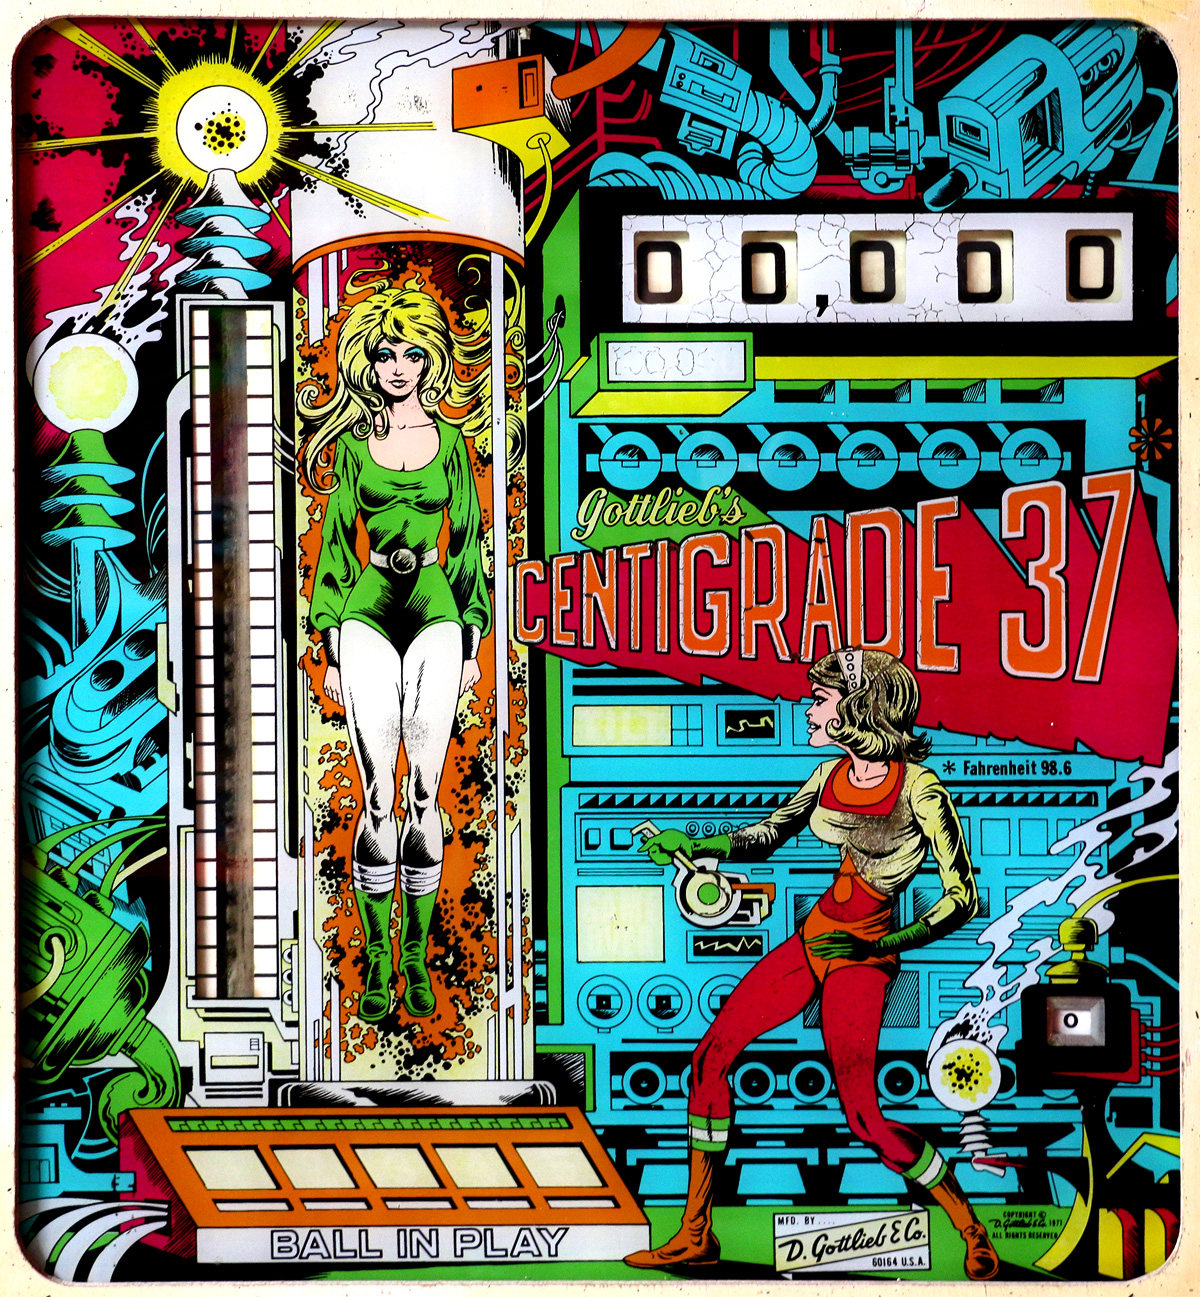 Centigrade 37 - Gottlieb - 1977 - NeoTeo